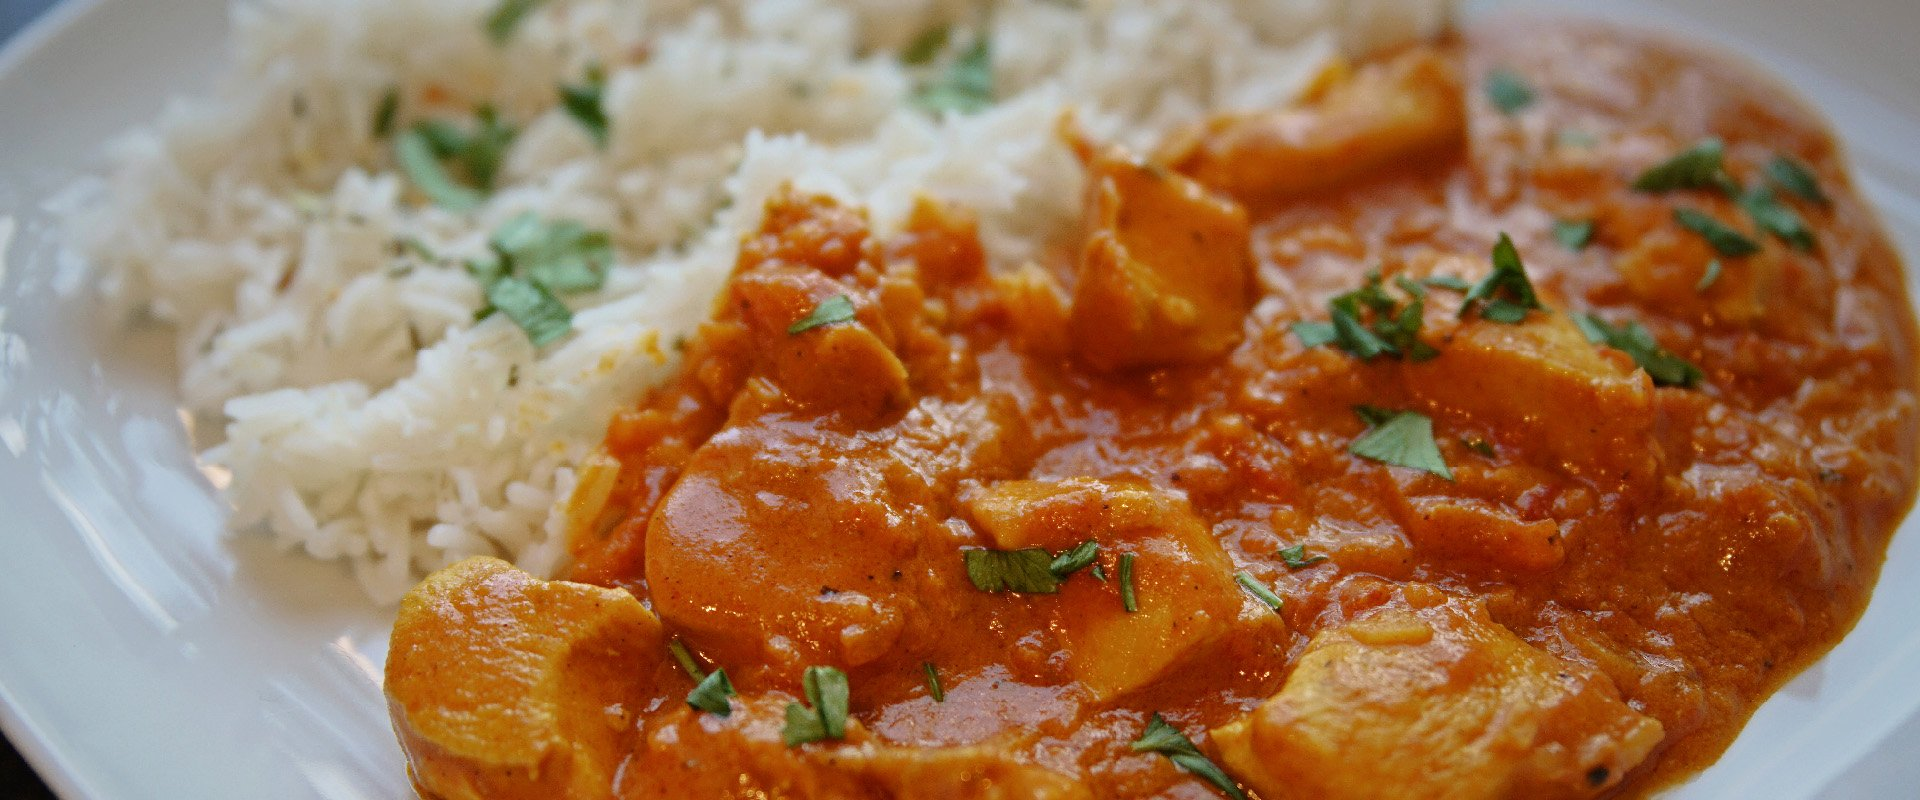 Article-hero-image-curry piletina.jpg